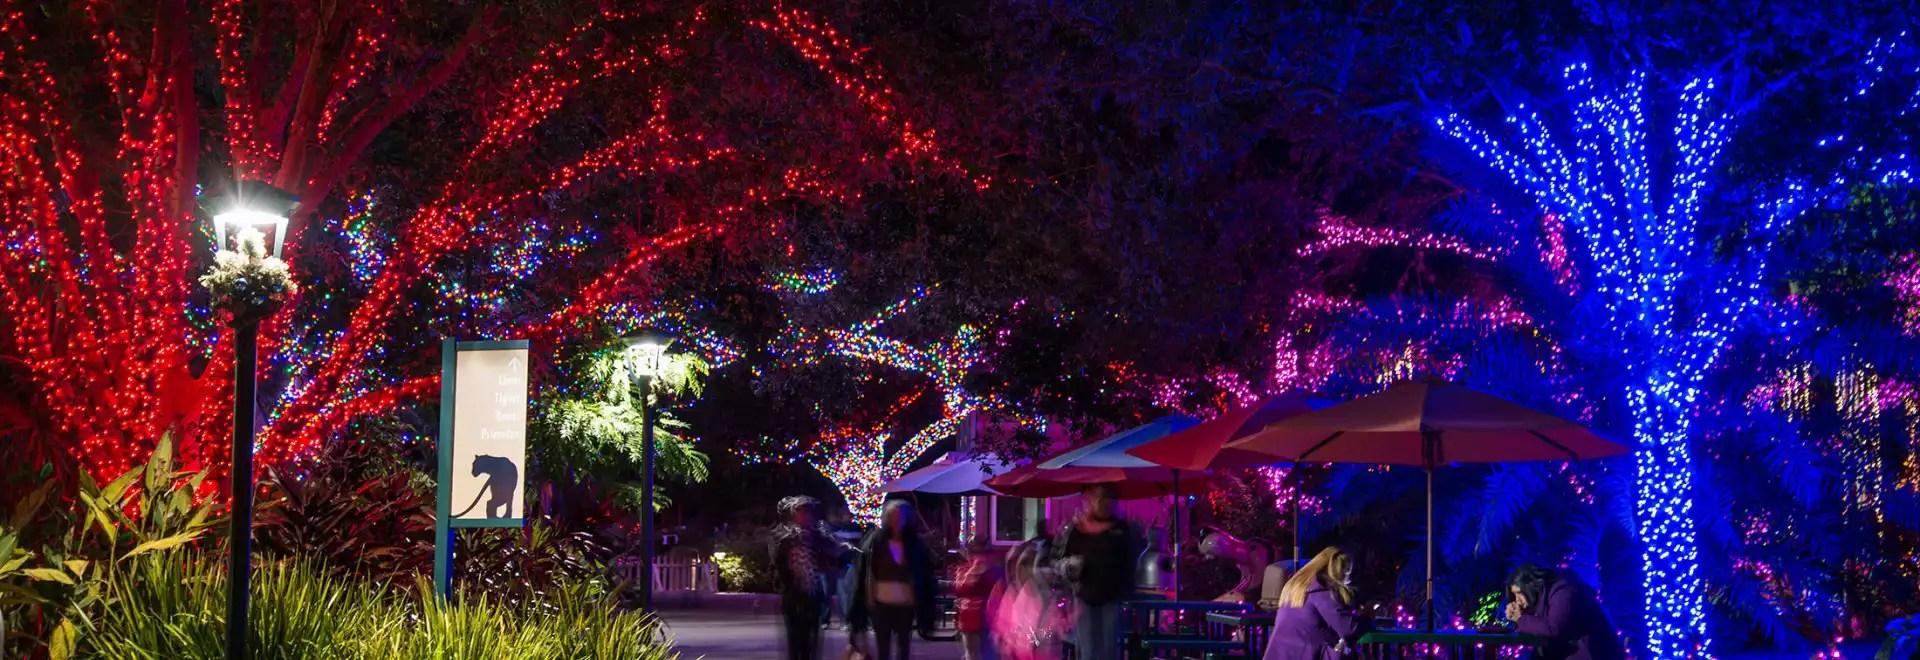 Zoo Lights Houston Texas